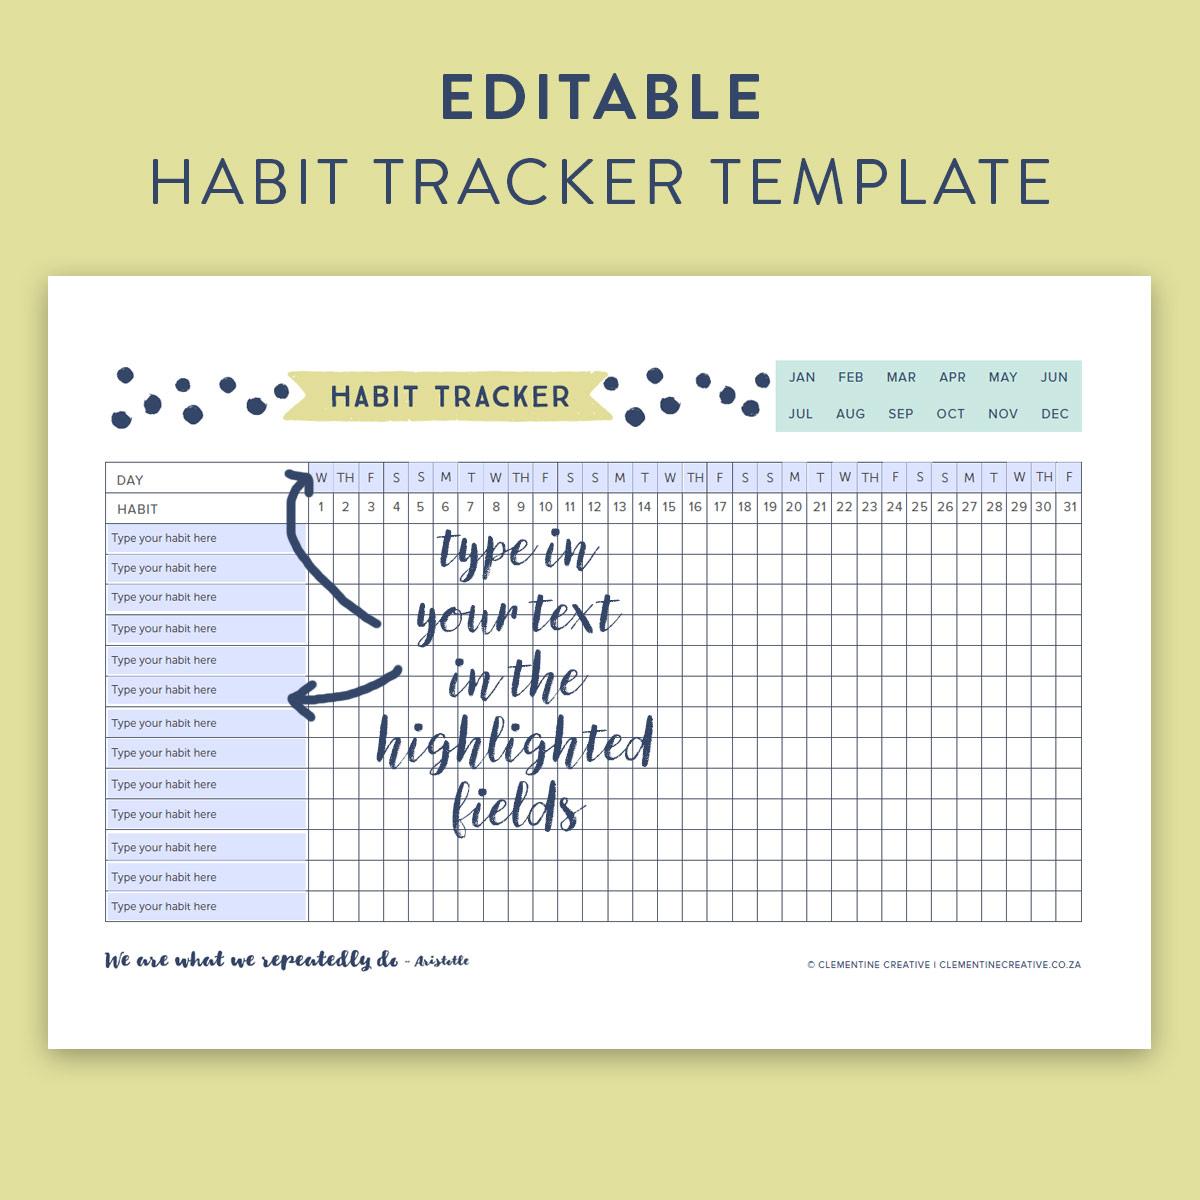 Printable Editable Habit Tracker